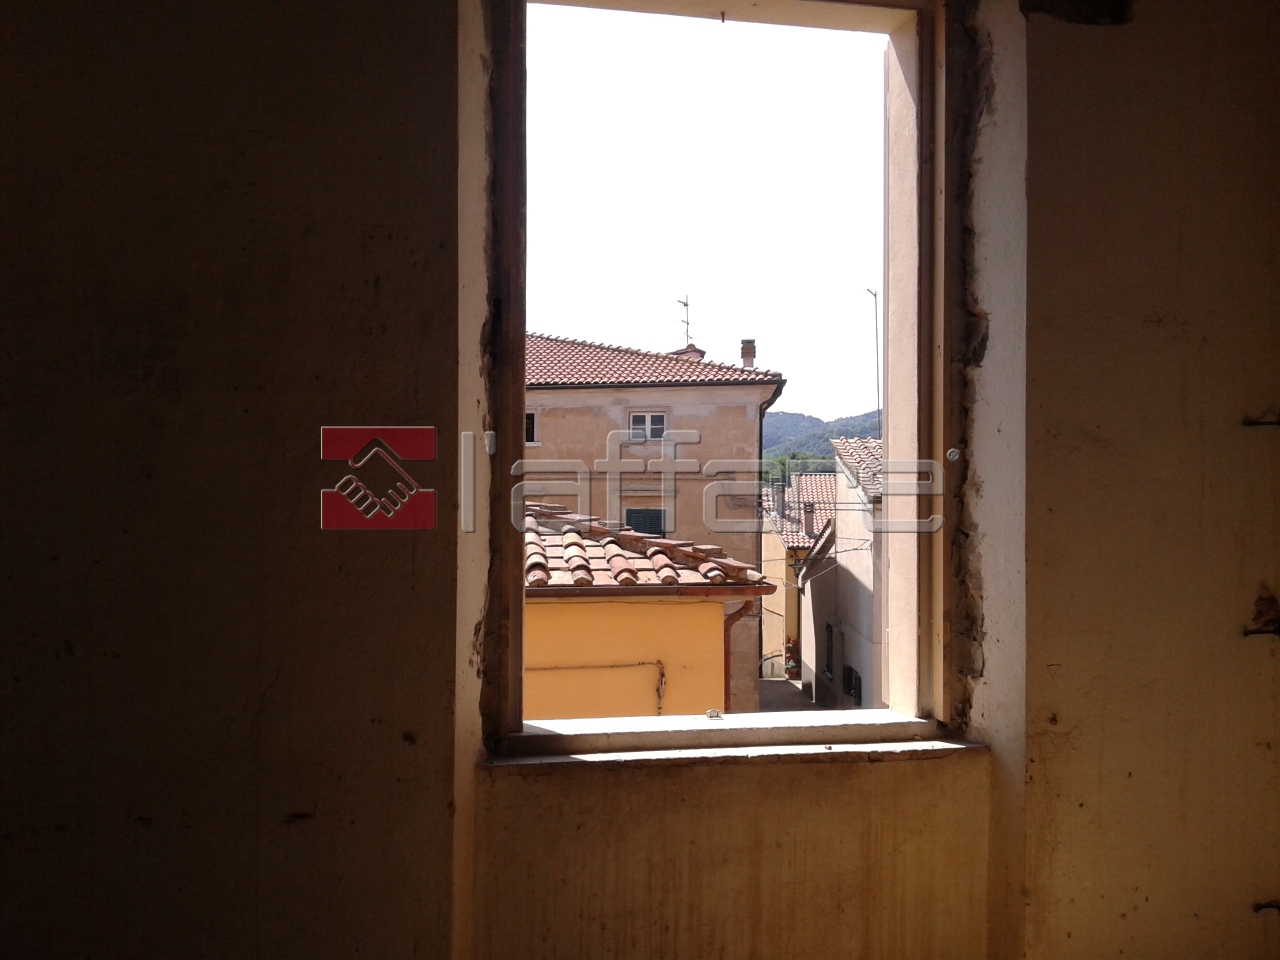 Casciana Terme Lari (5/5)